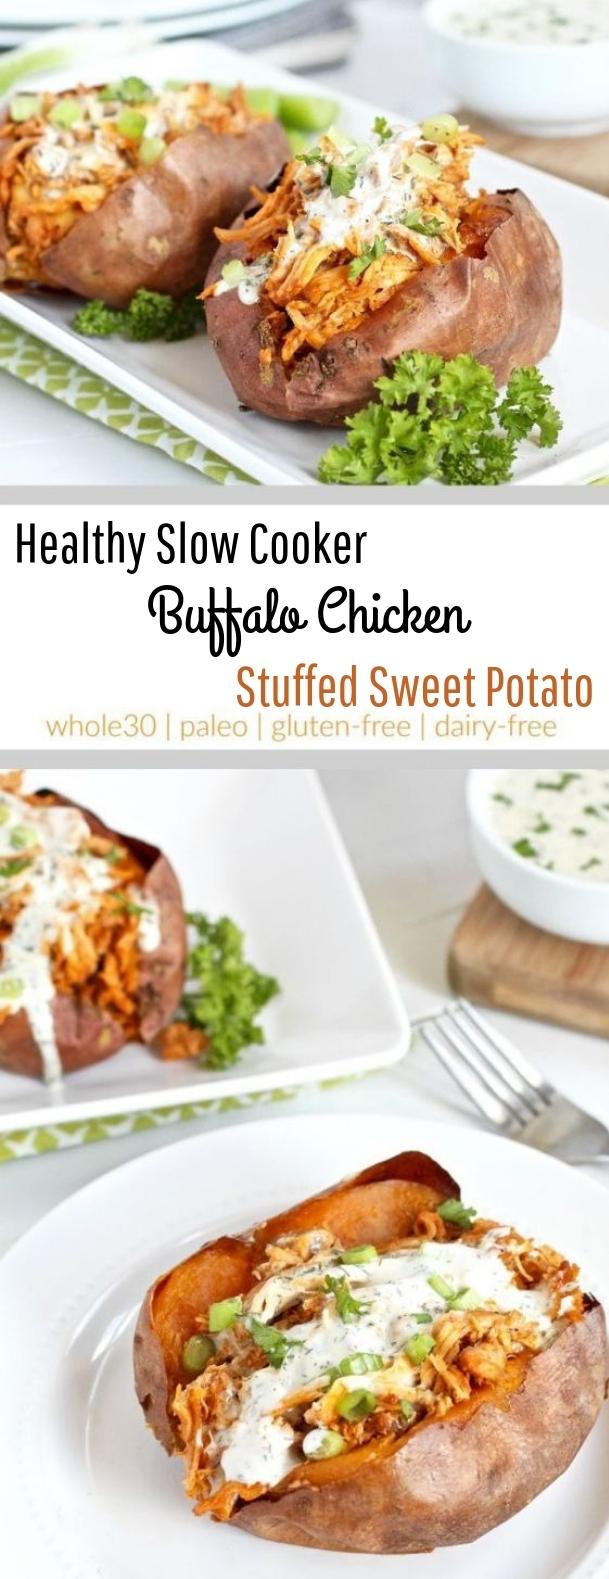 Slow Cooker Buffalo Chicken Stuffed Sweet Potato #slowcooker #paleo